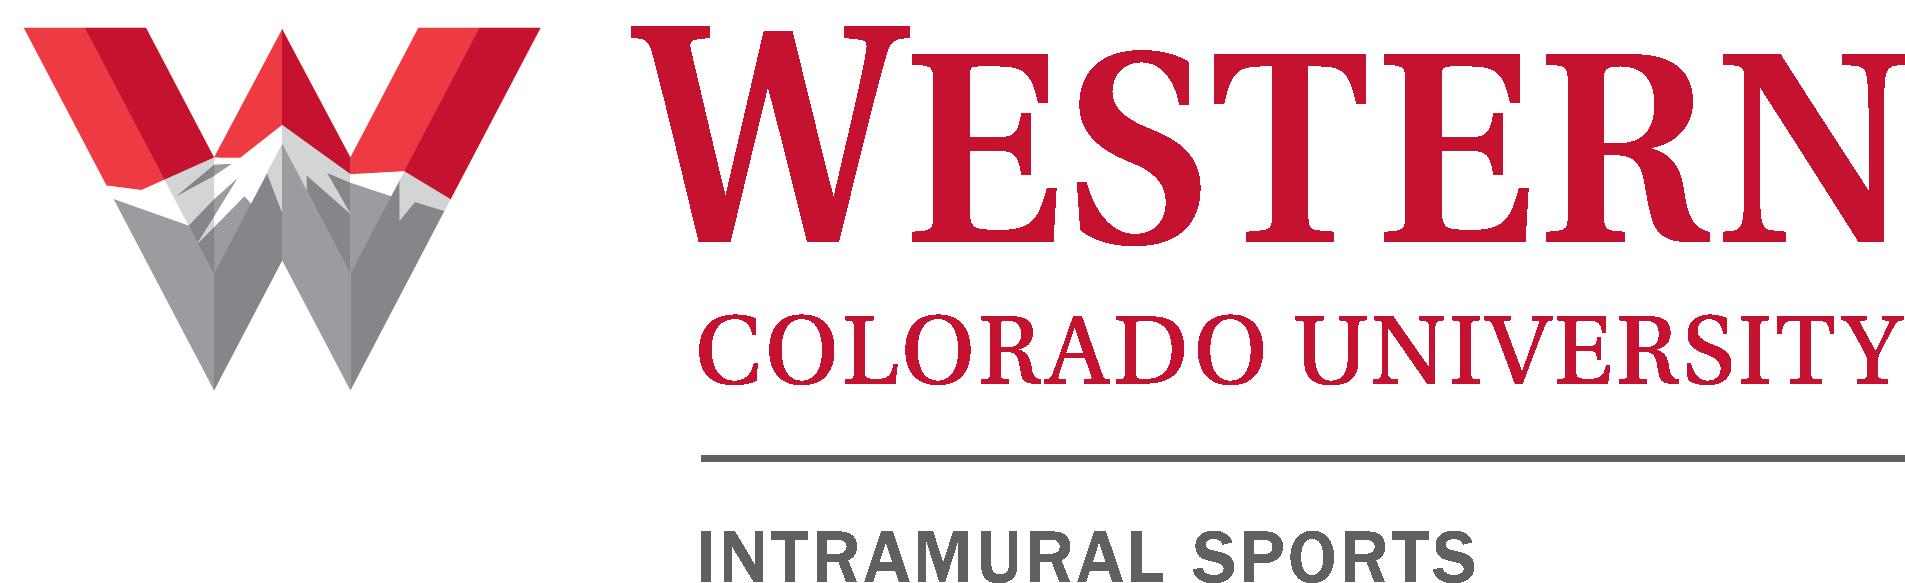 Western Colorado University >> Imleagues Western Colorado University Intramural Home